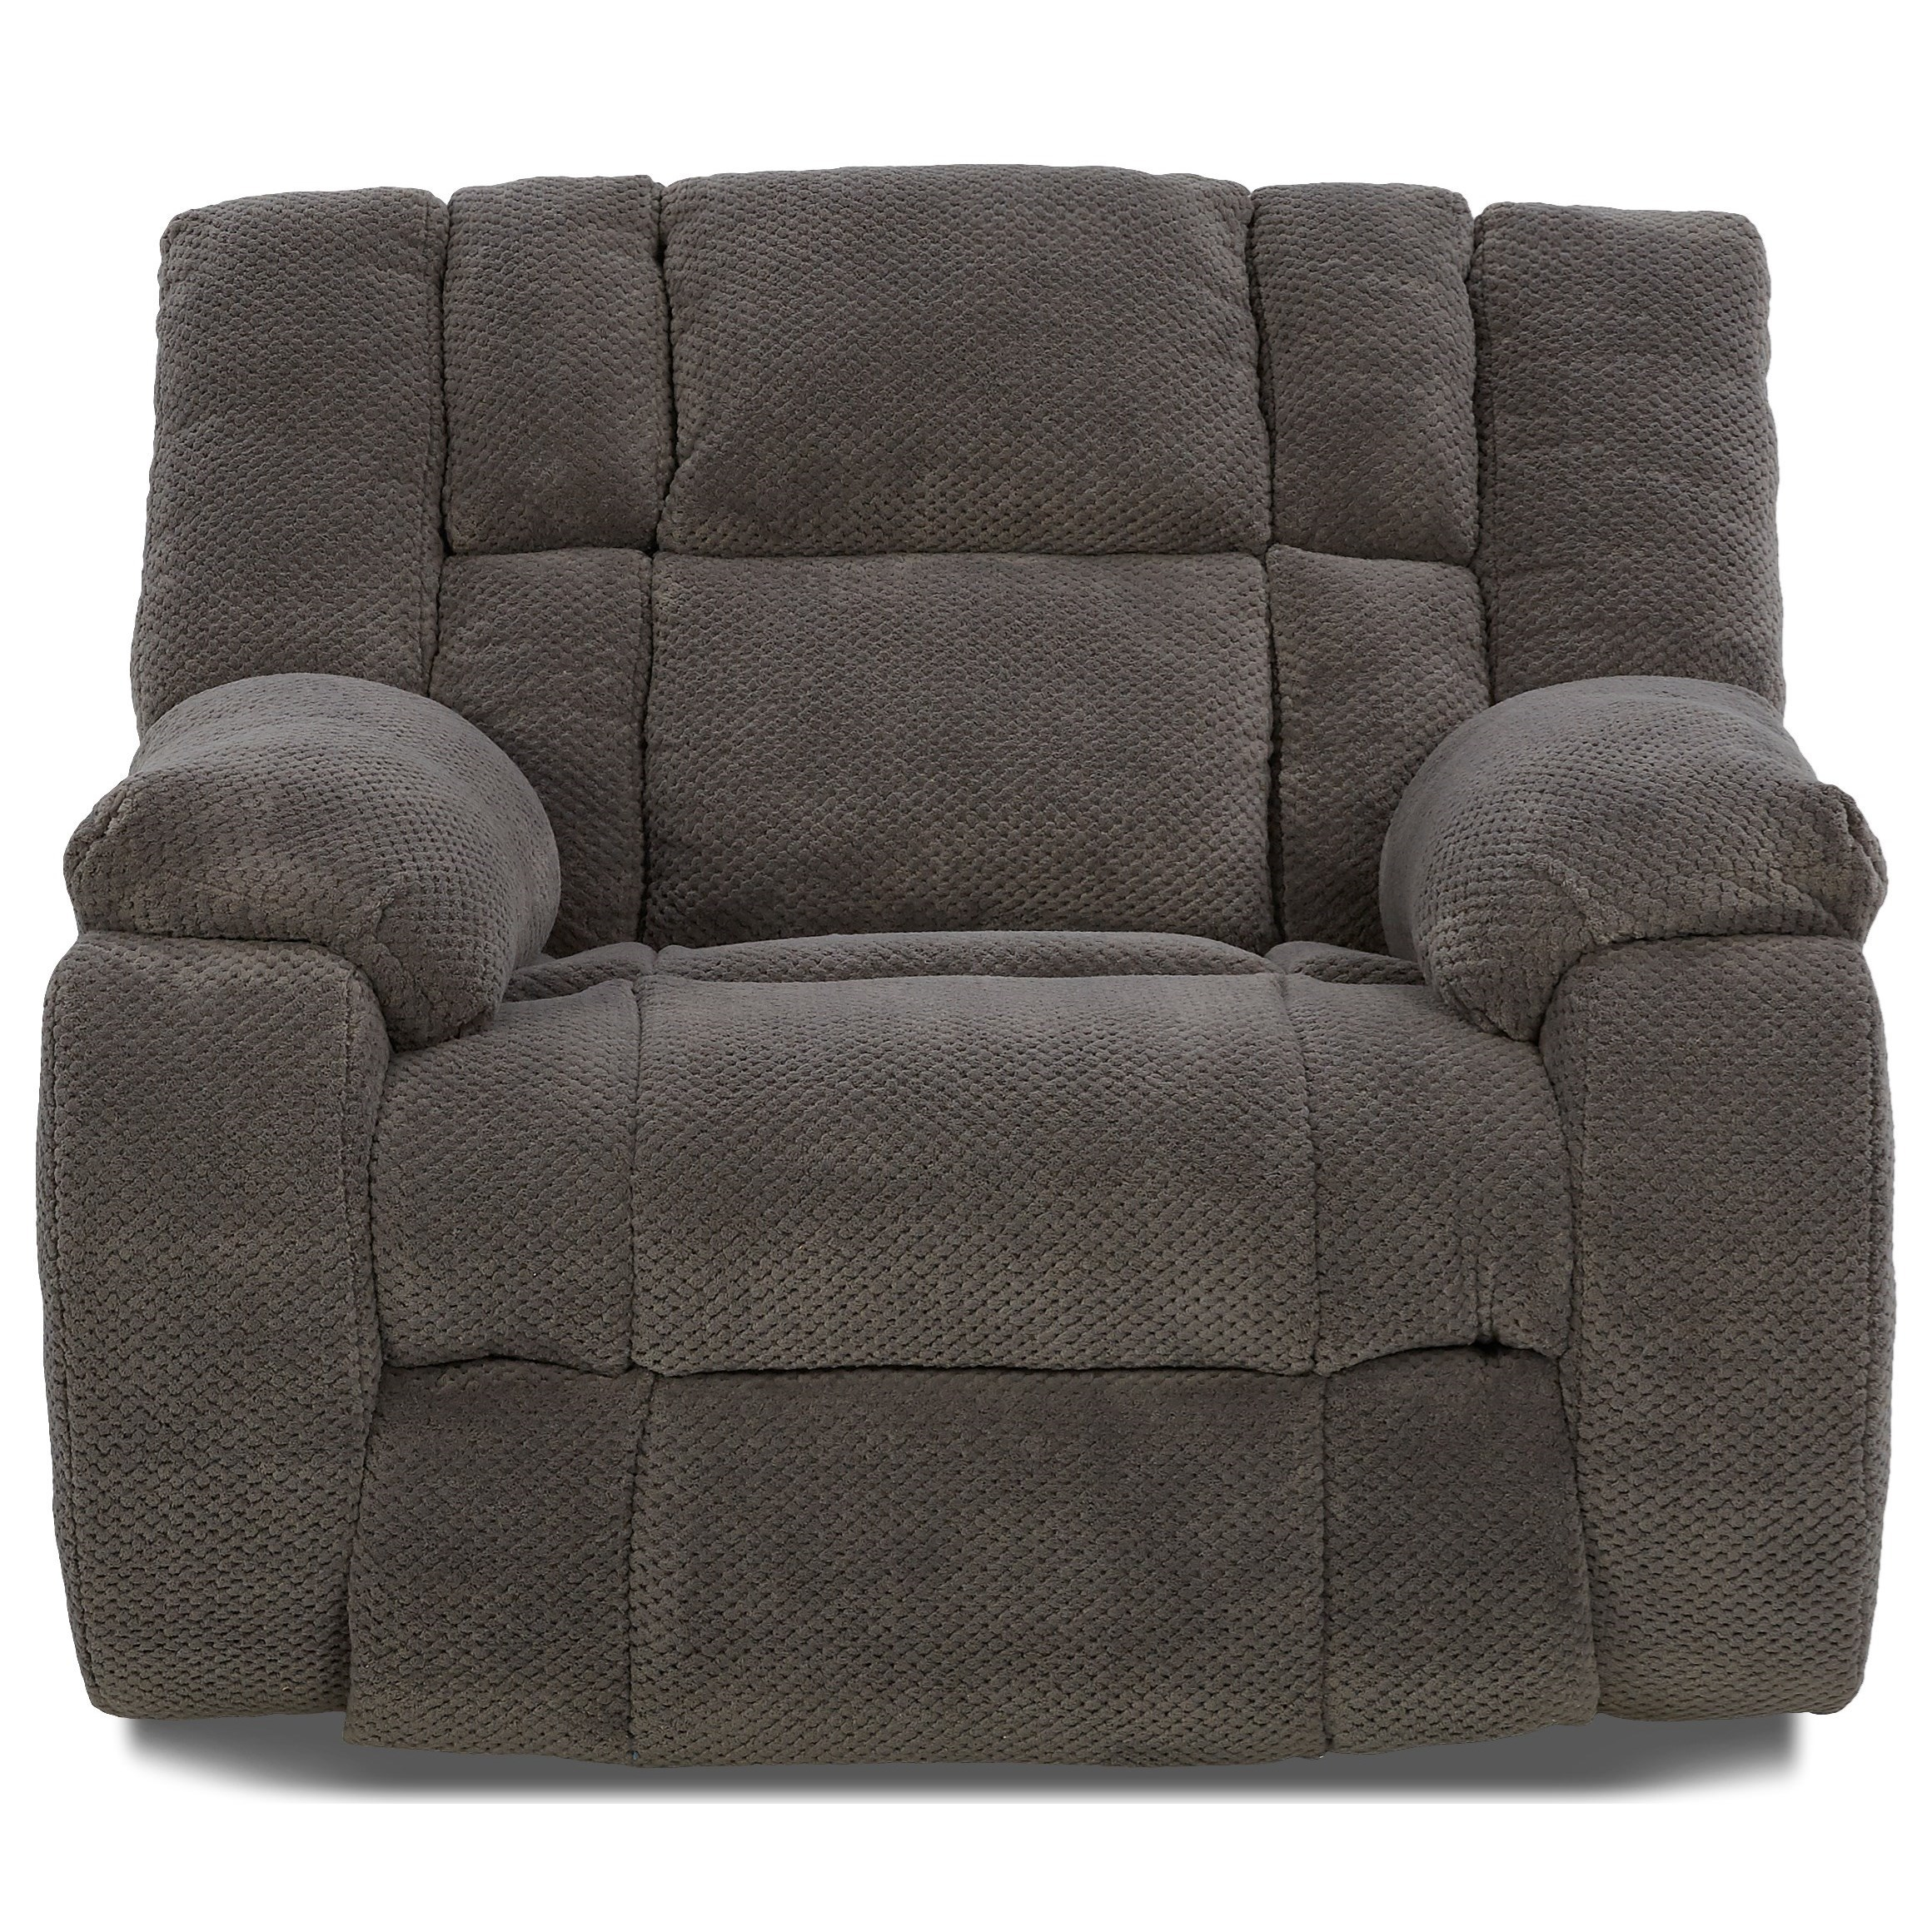 Klaussner Dozer Dozer Casual Reclining Chair U0026 A Half